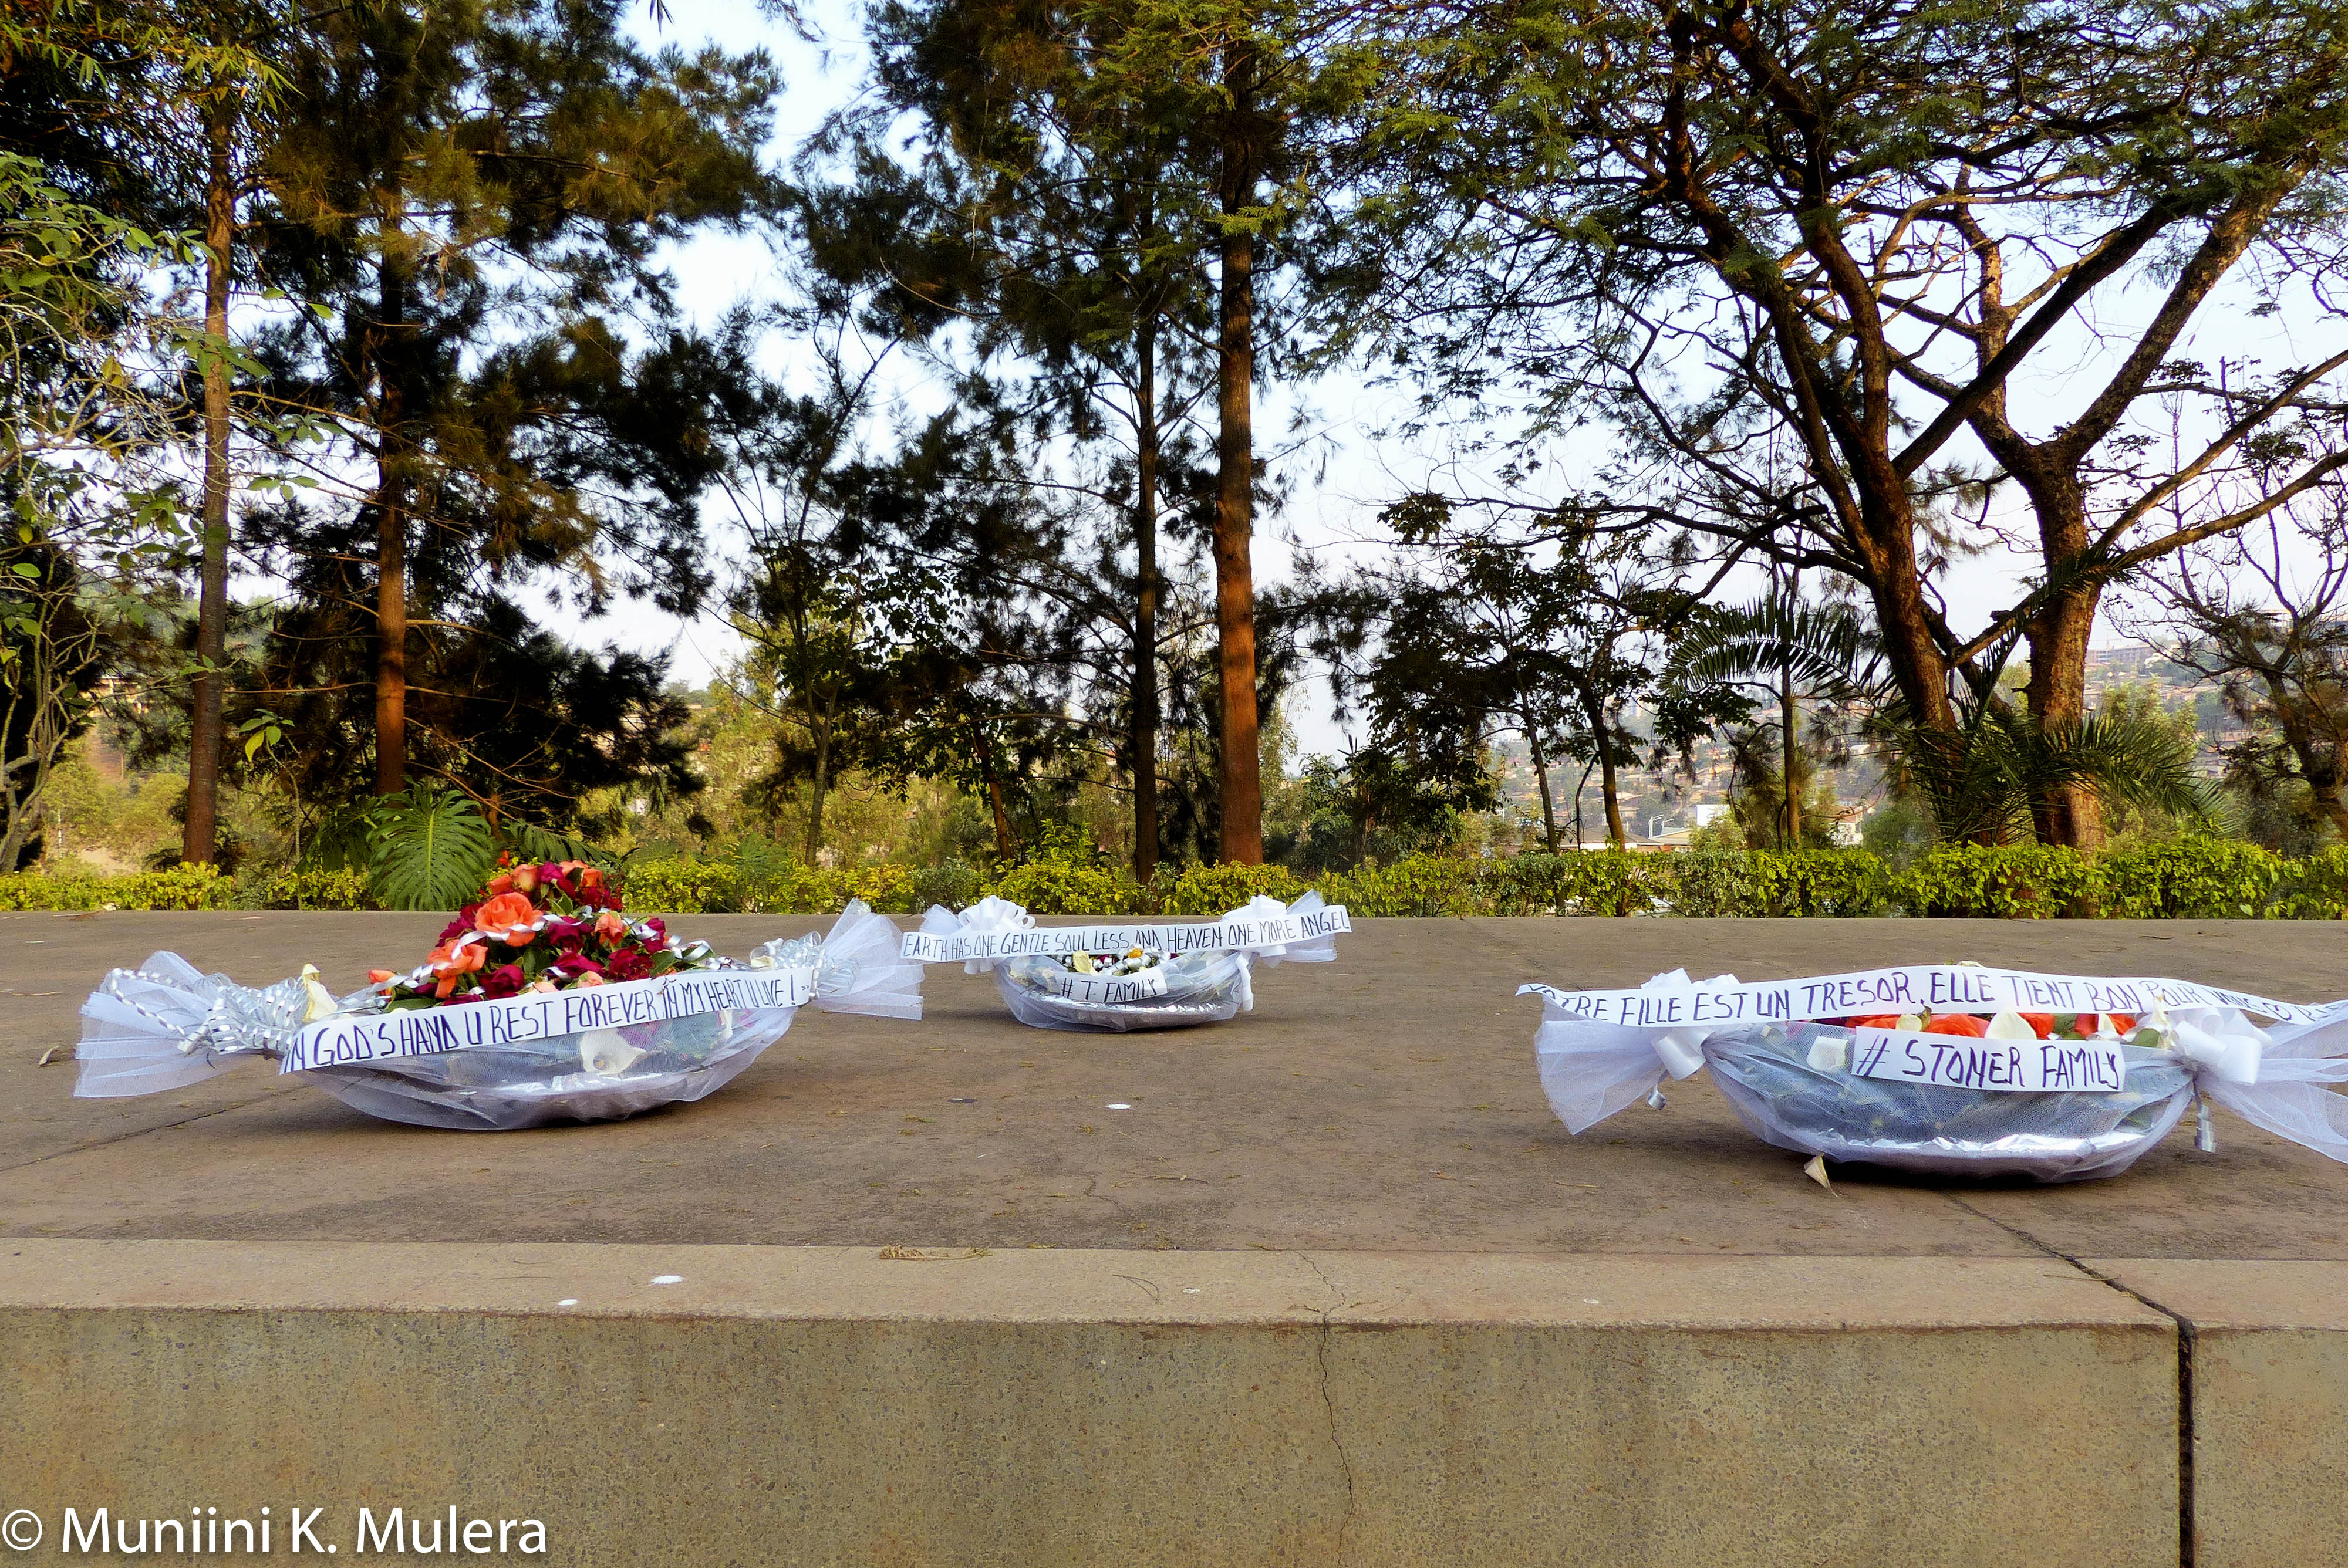 Genocide Memorial Kigali - Mass Grave